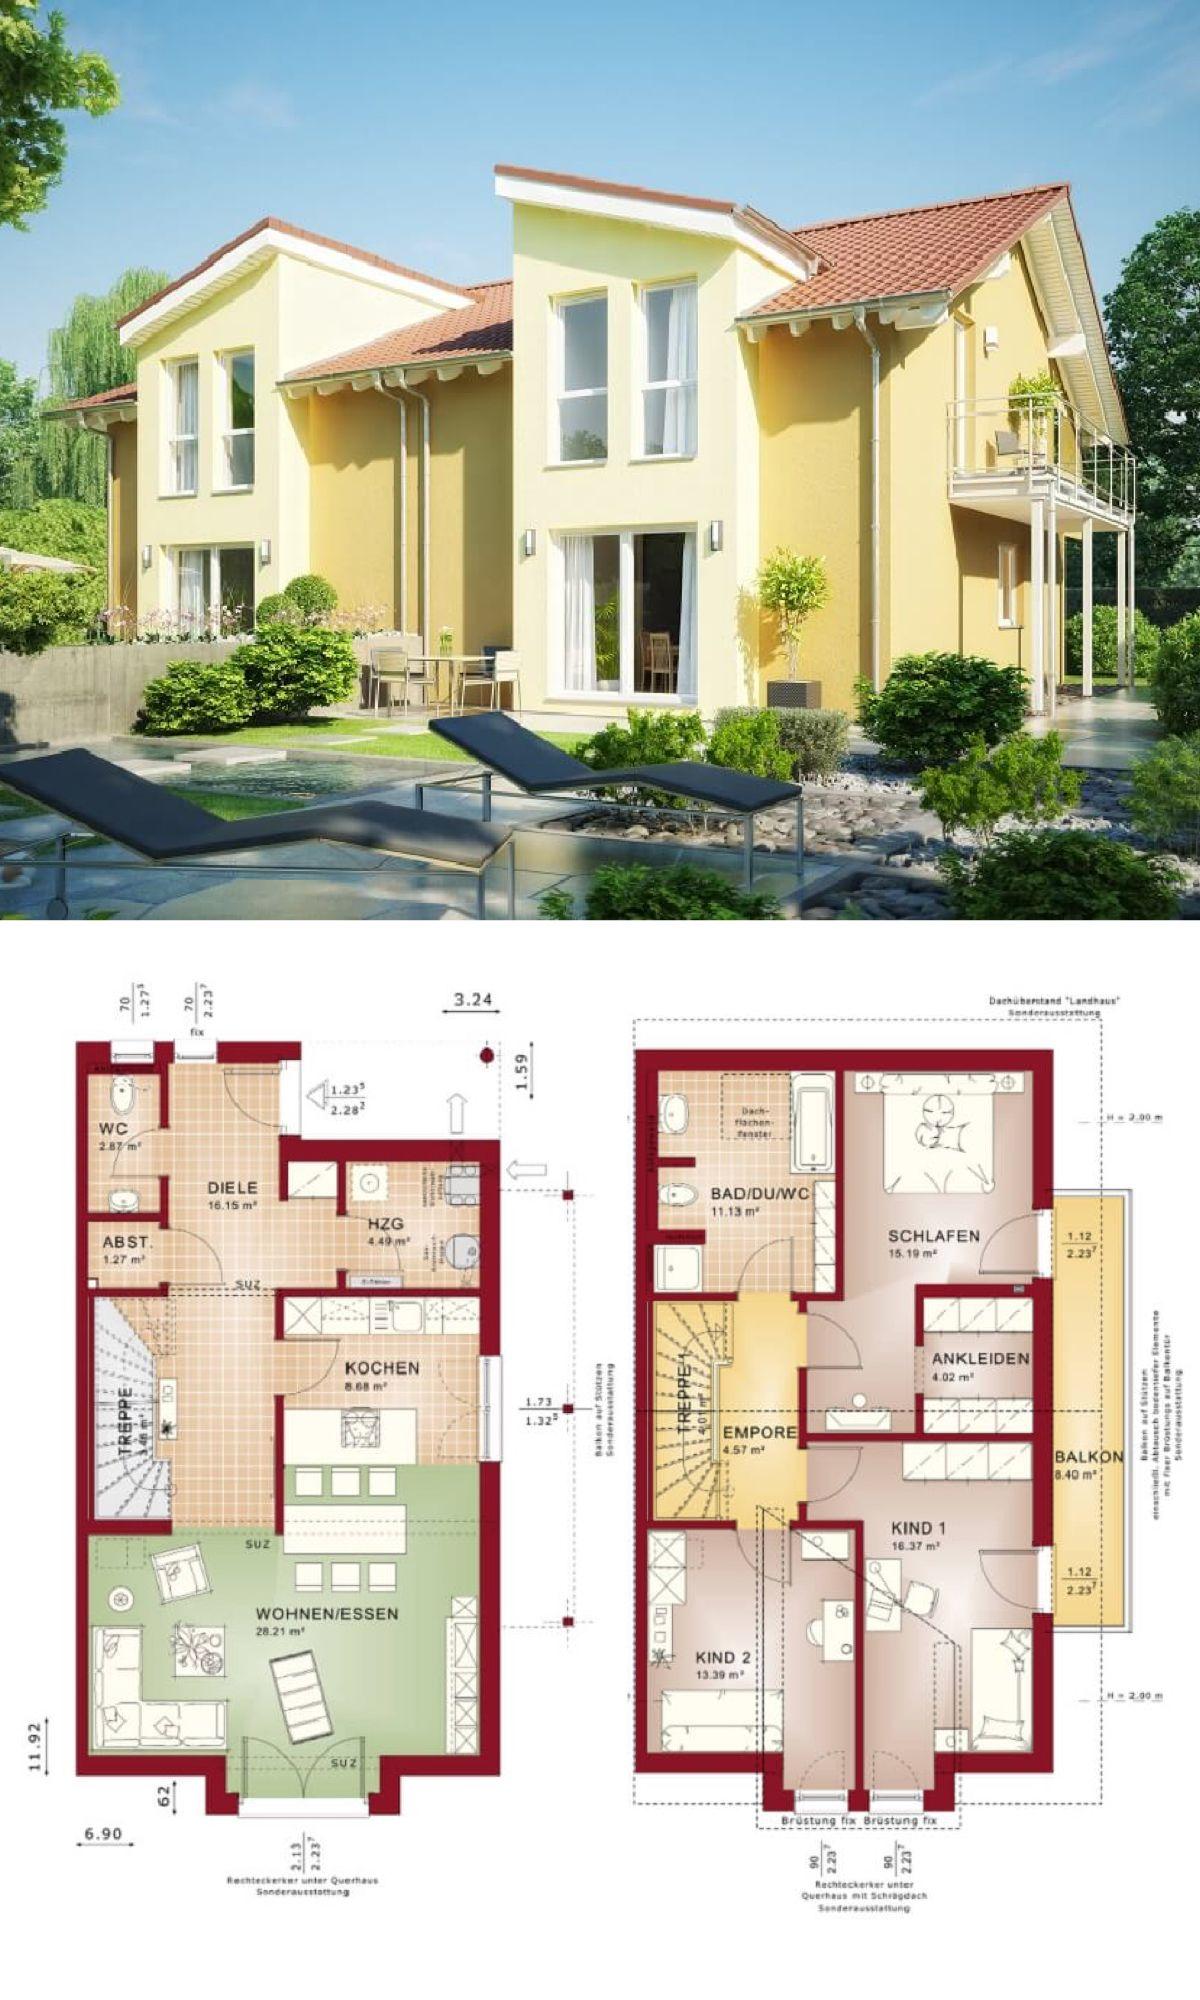 doppelhaus architektur mit satteldach haus celebration 131 v3 l bien zenker fertighaus doppelhaushlfte grundriss - Fertighausplne